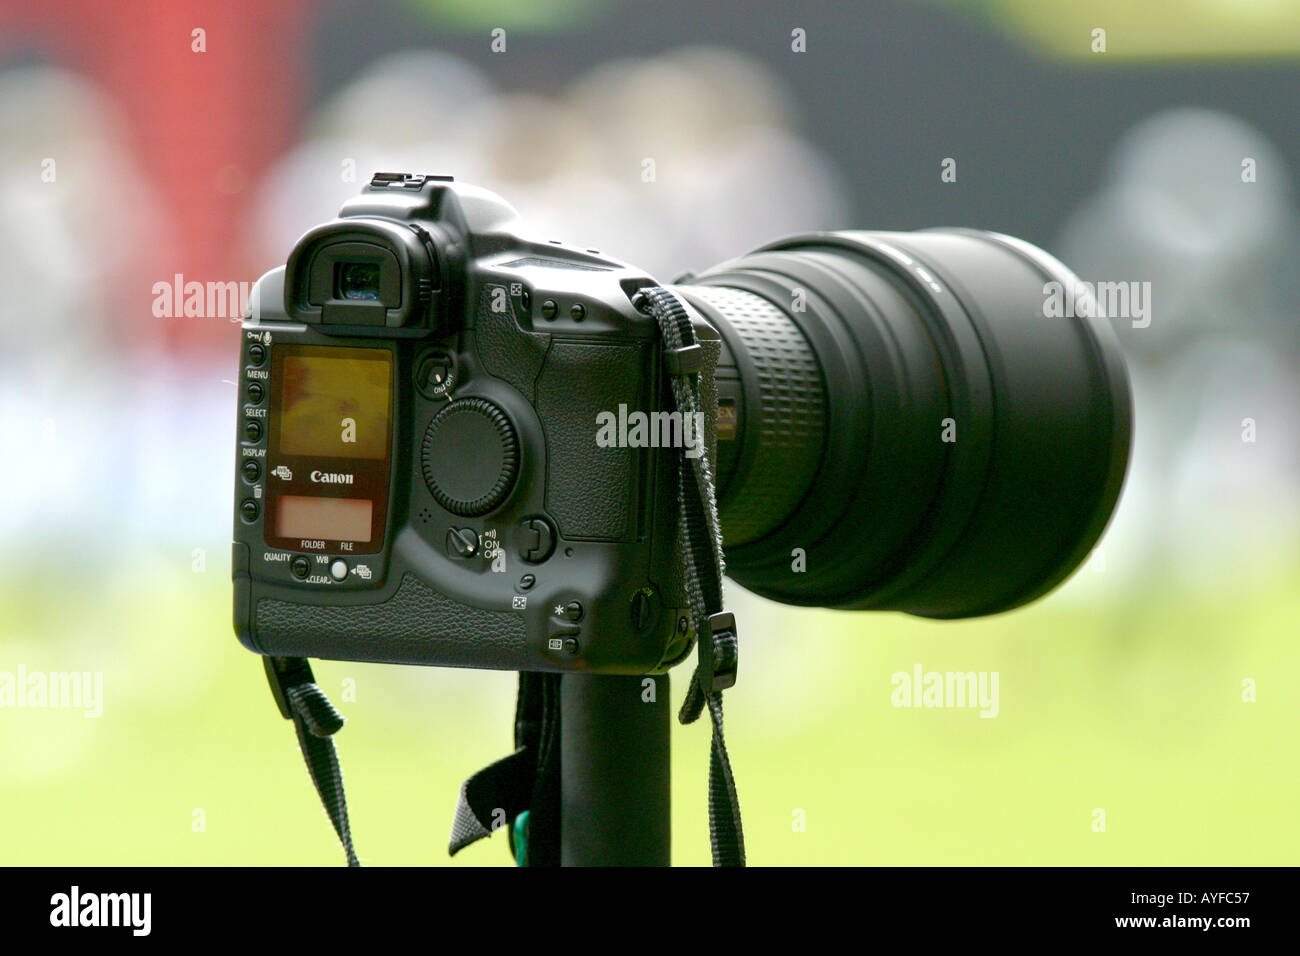 Digital SLR camera on monpod at sports event - Stock Image